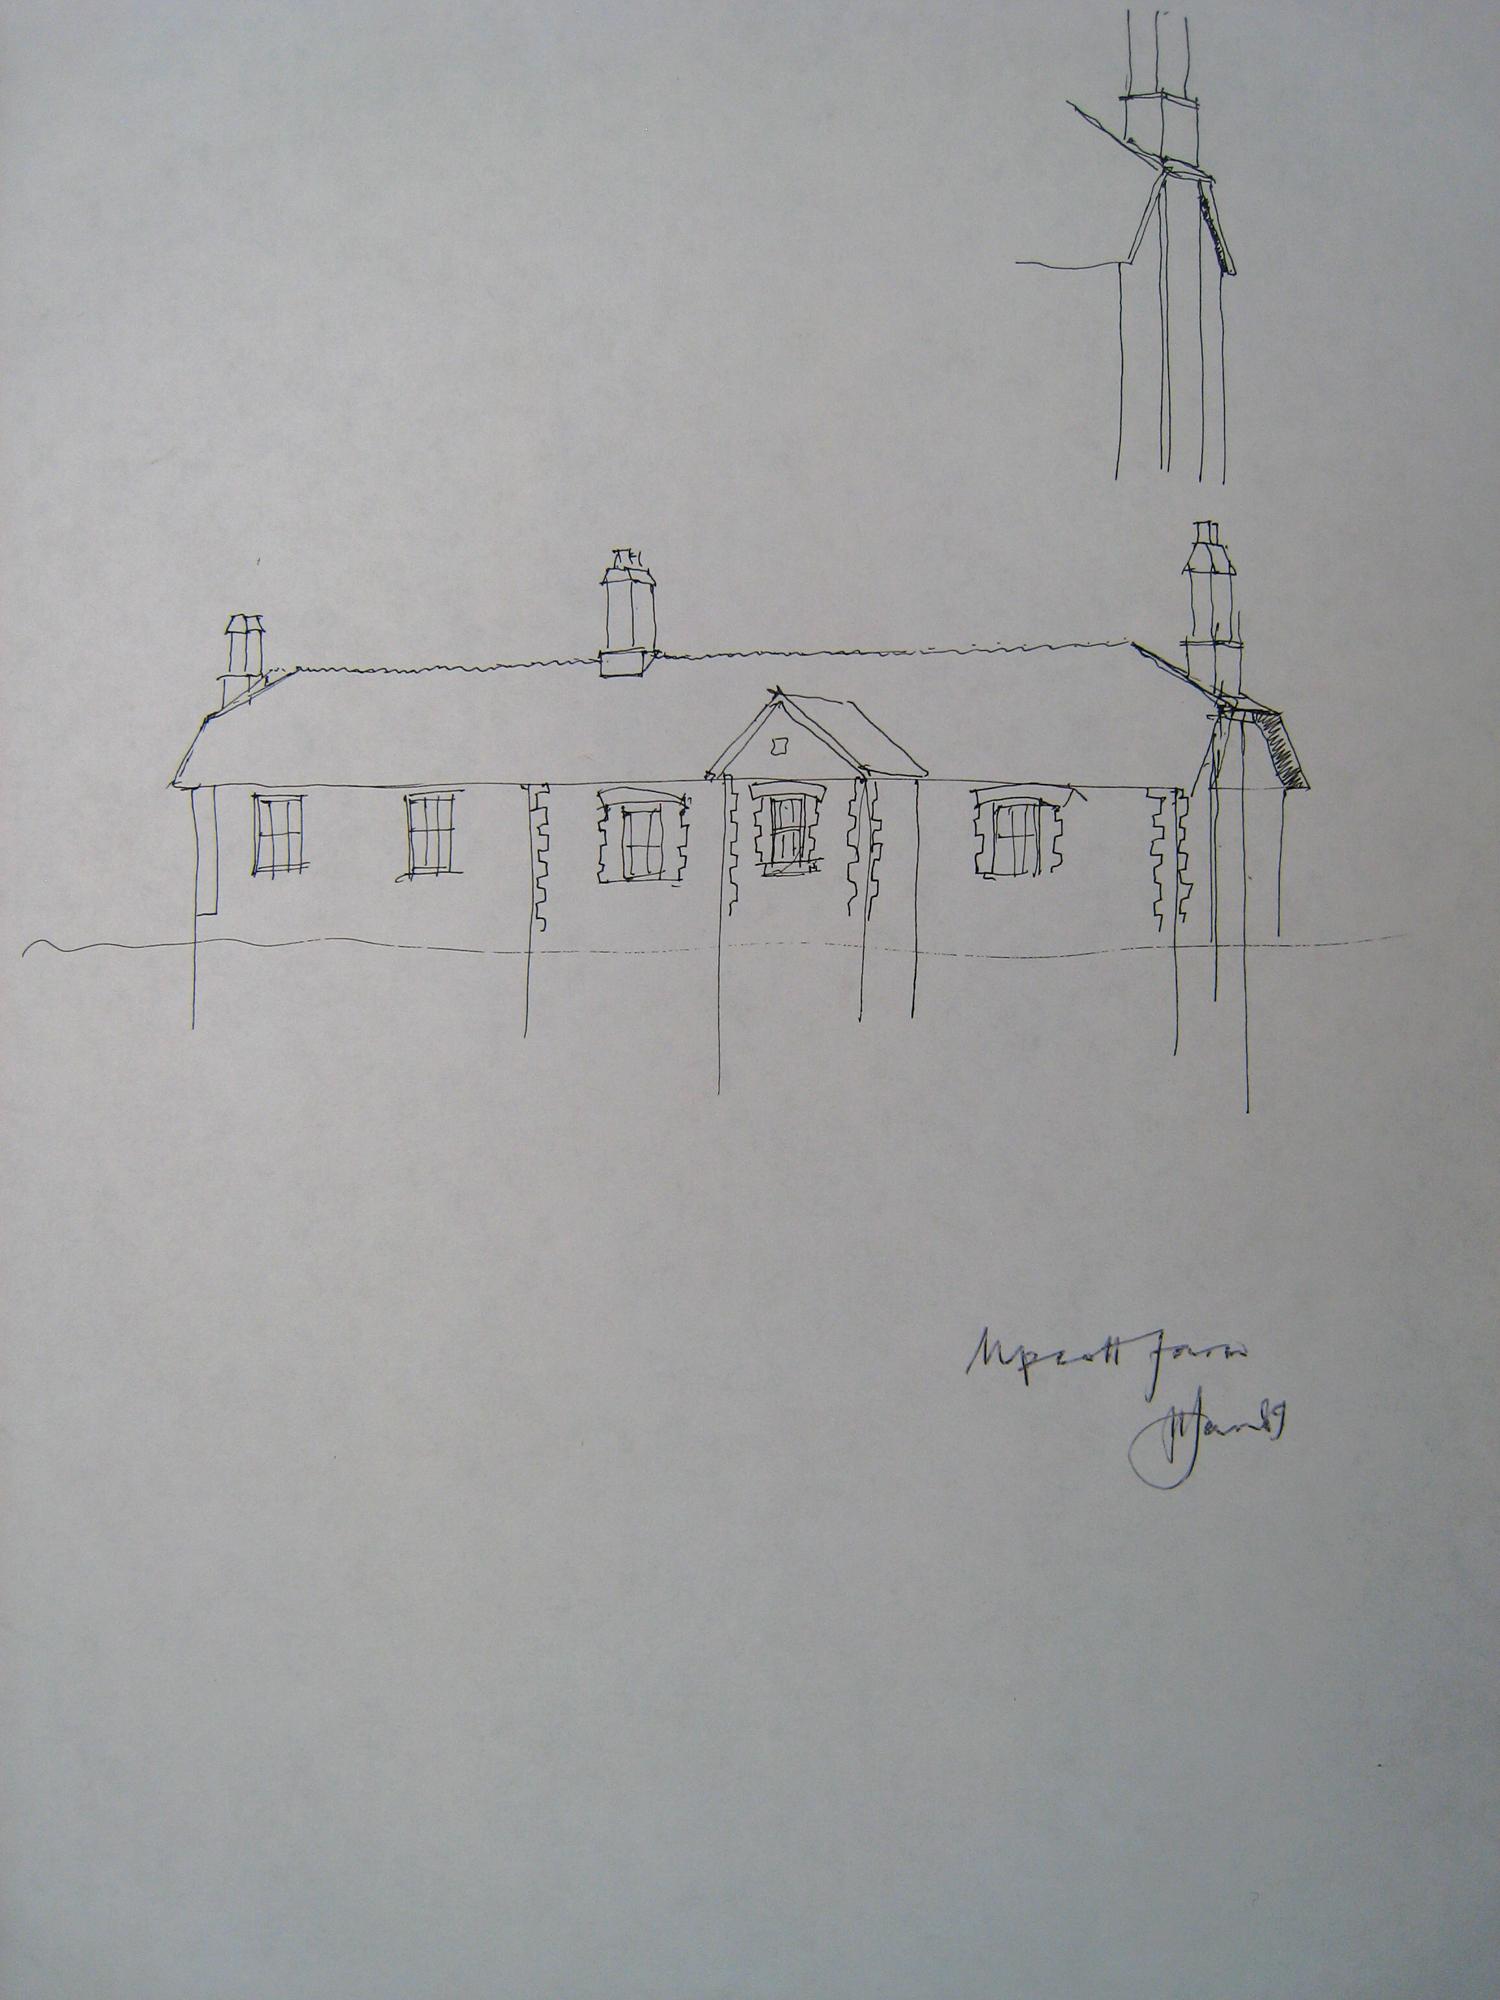 Upcott  Farm sketch